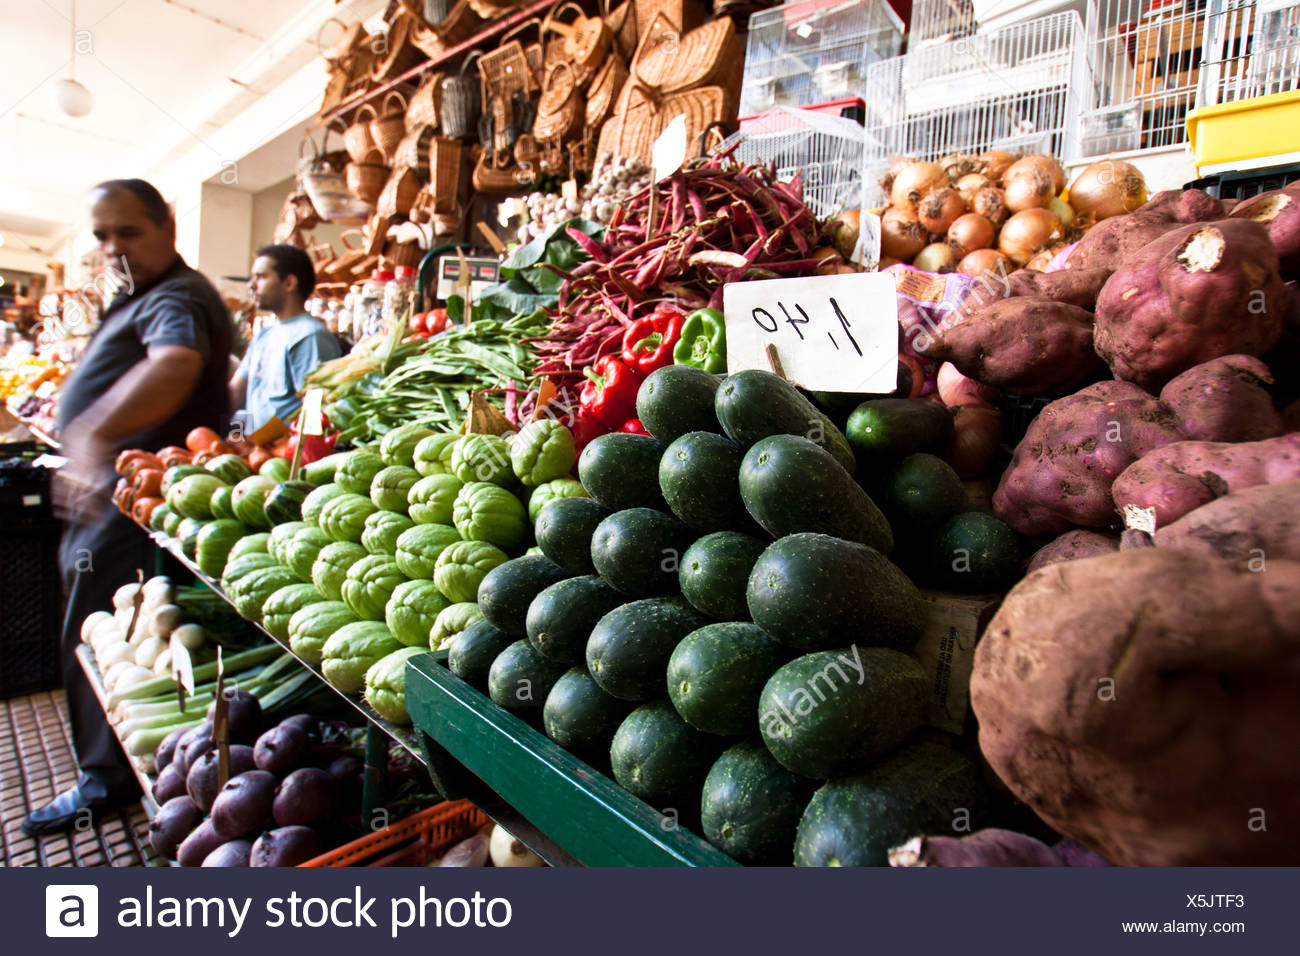 Greengrocery at Mercado dos Lavradores, Funchal, Madeira. - Stock Image